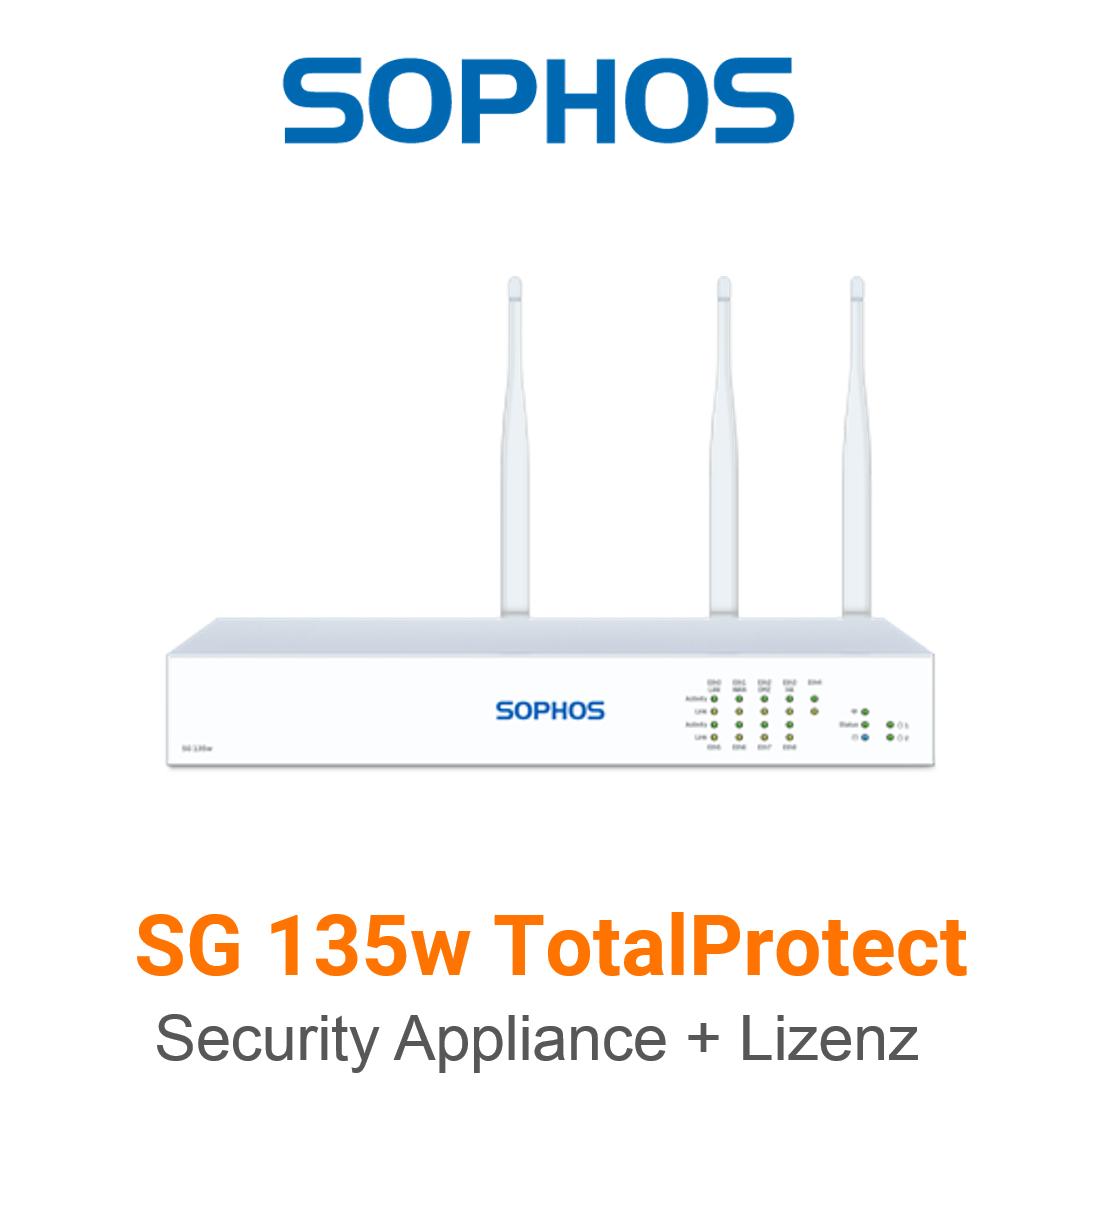 Sophos SG 135w TotalProtect Bundle (Hardware + Lizenz)